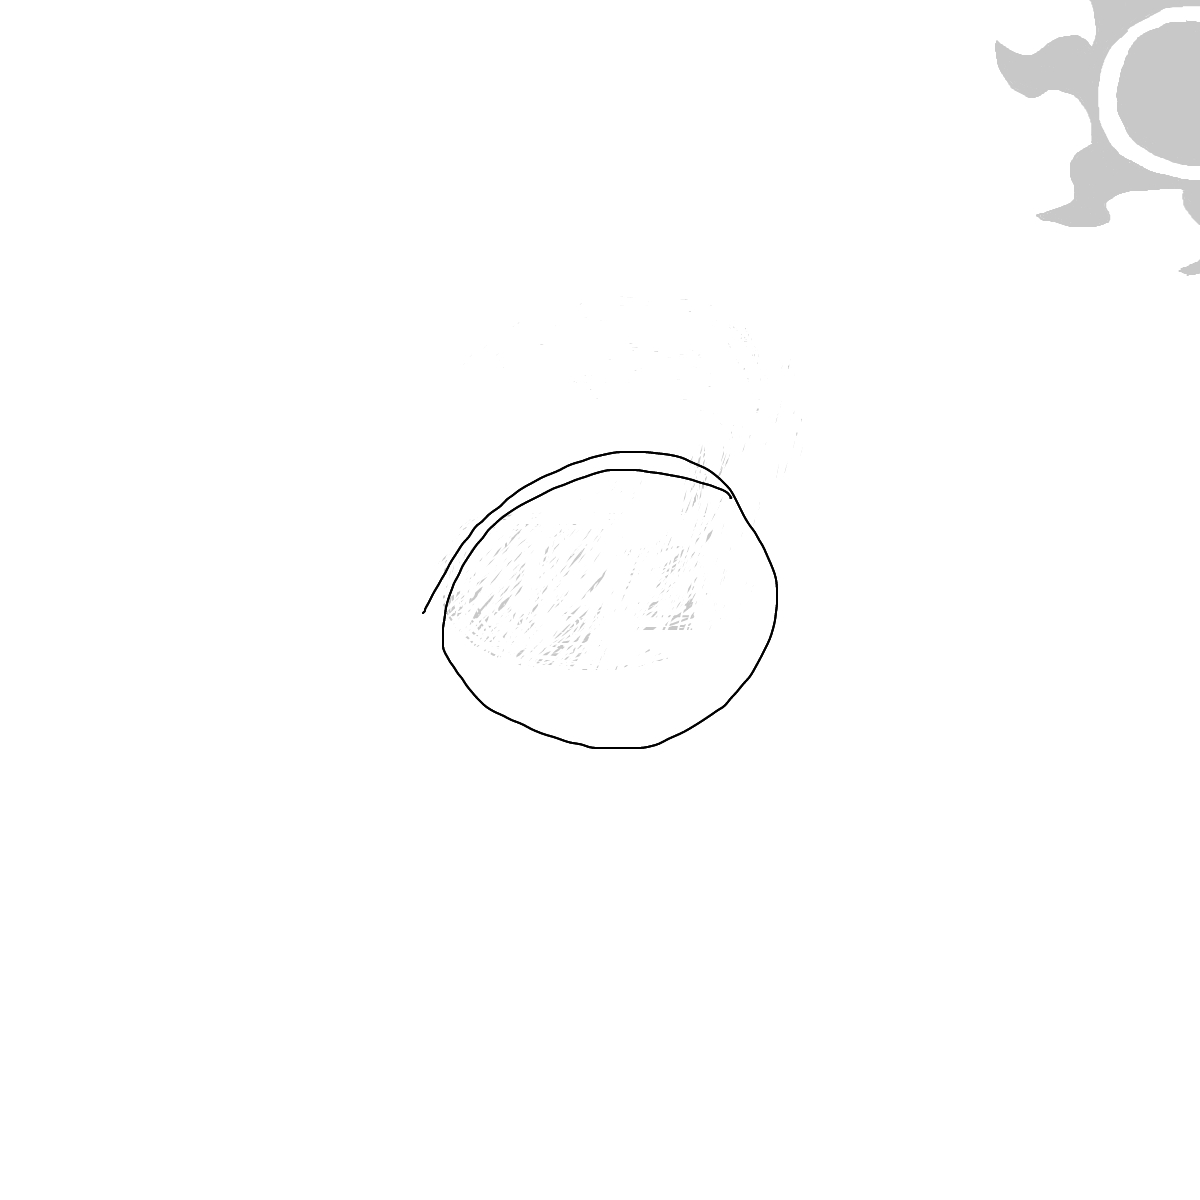 BAAAM drawing#13410 lat:38.2182960510253900lng: -85.7577743530273400